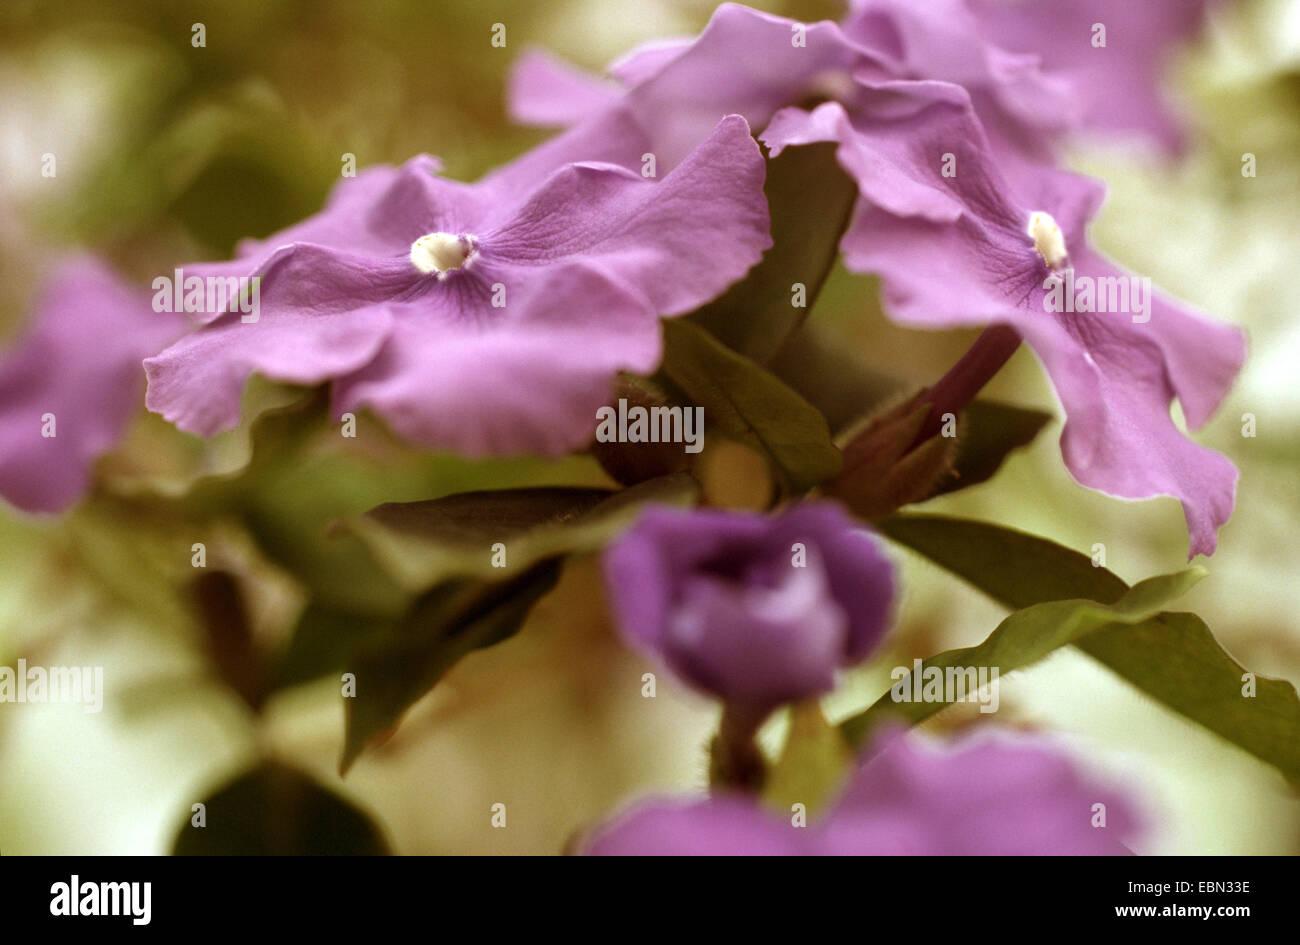 Brazil Raintree (Brunfelsia pauciflora var. calycina), blooming - Stock Image